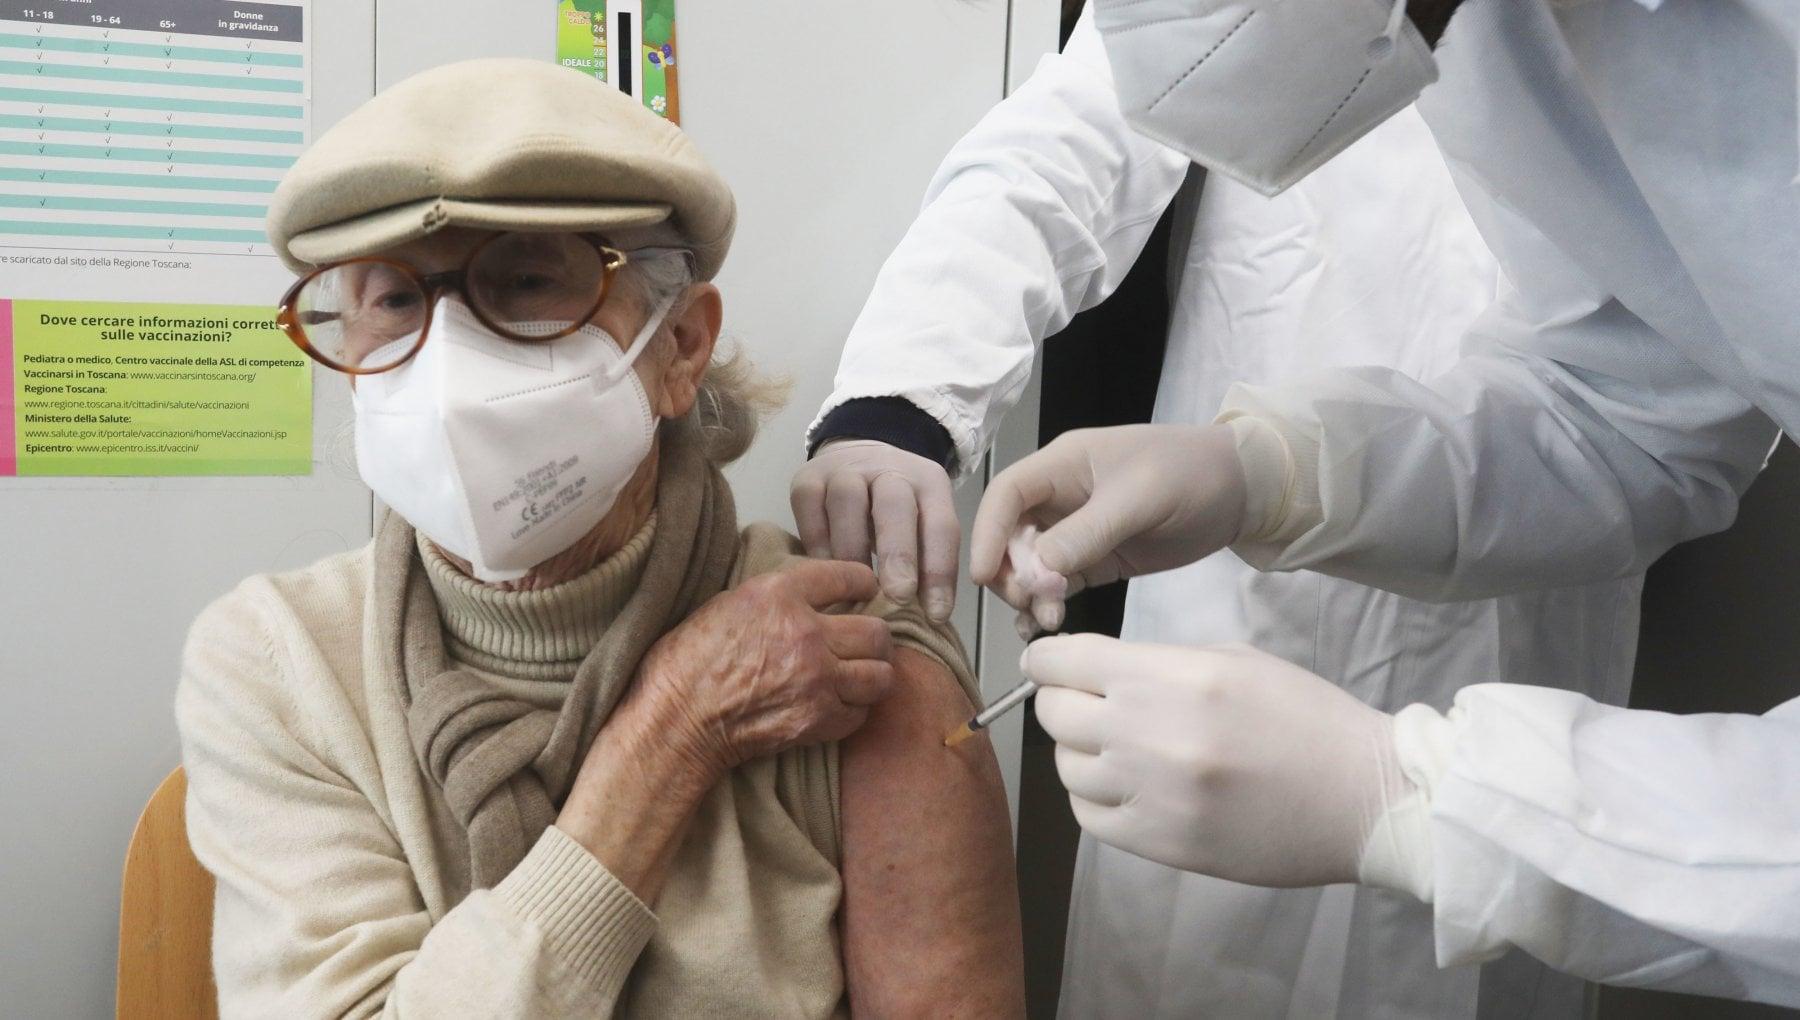 Regione Toscana Vaccinazioni over 80